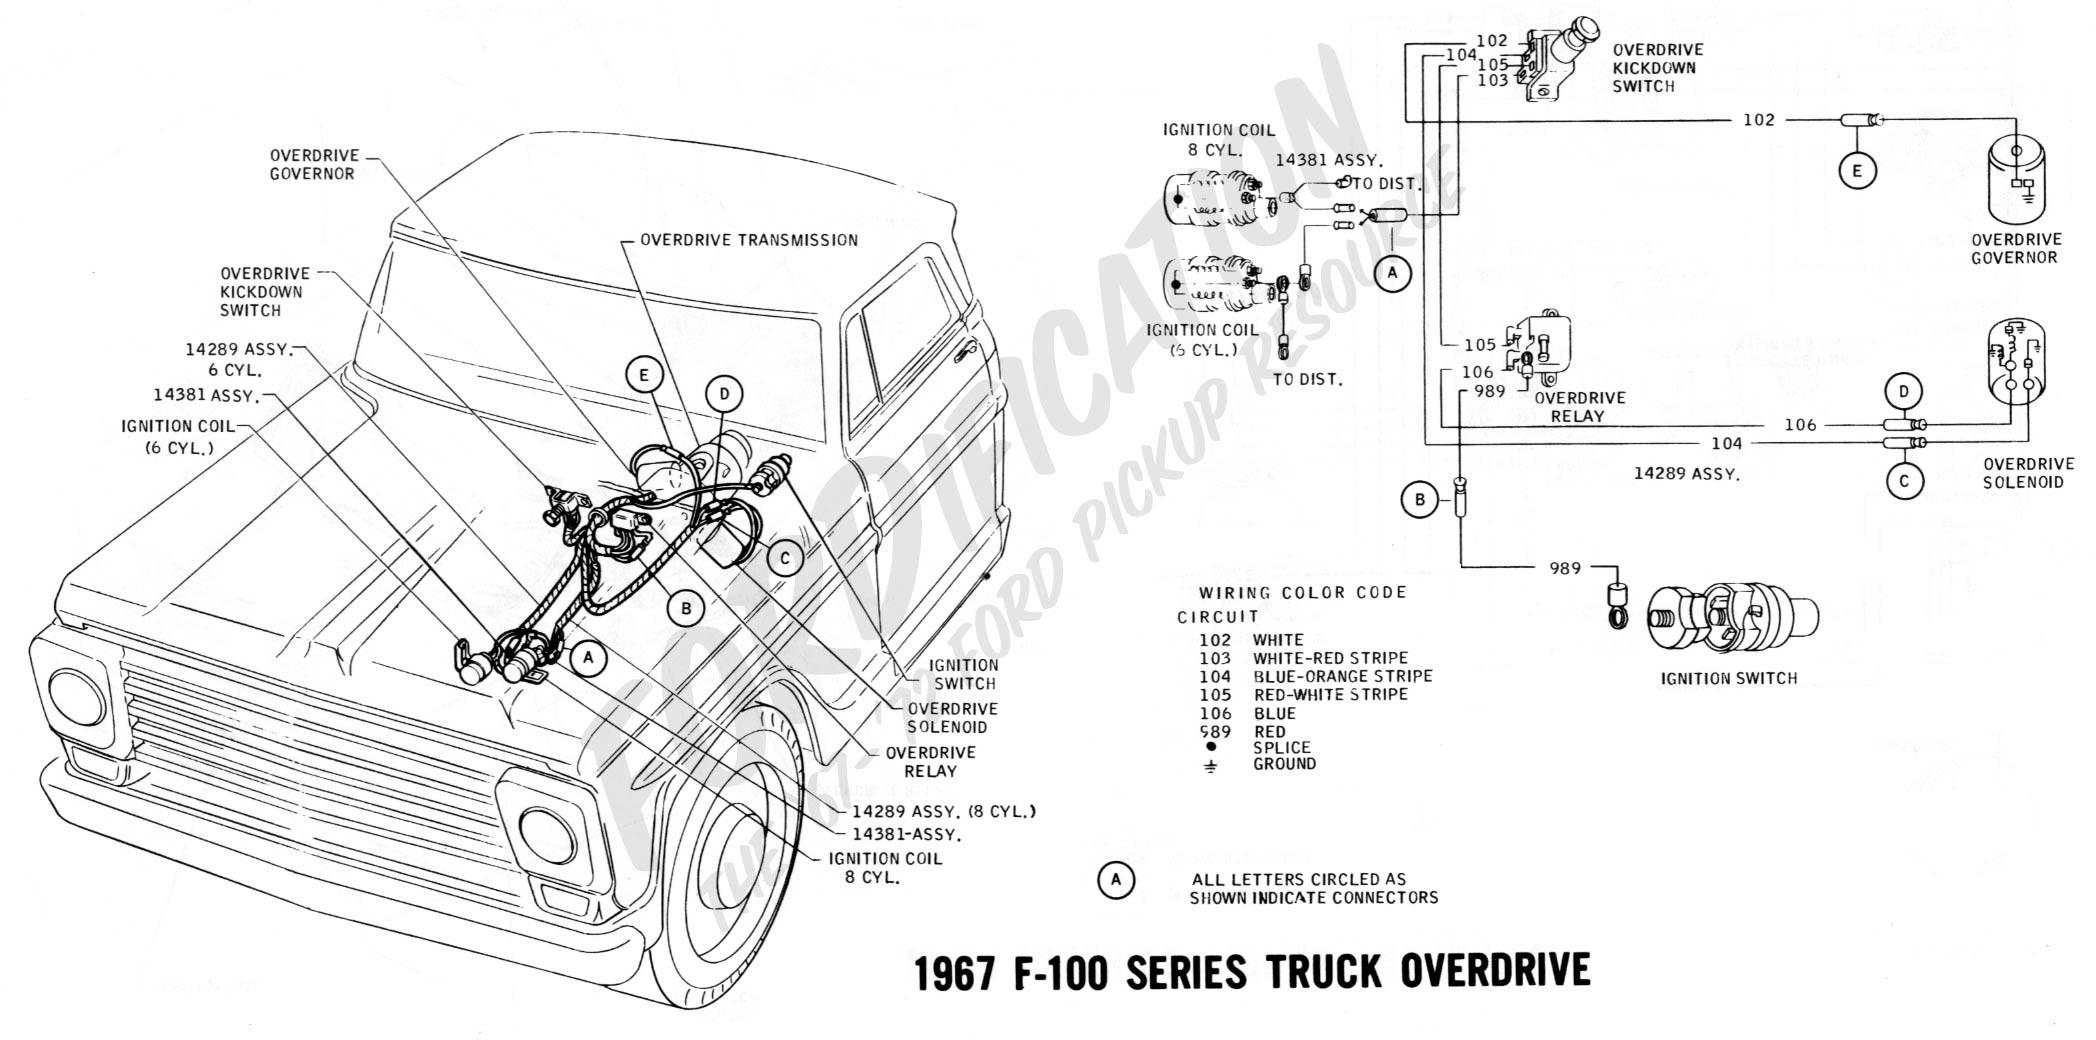 1979 chevy truck wiring diagram wye delta motor control ford steering column